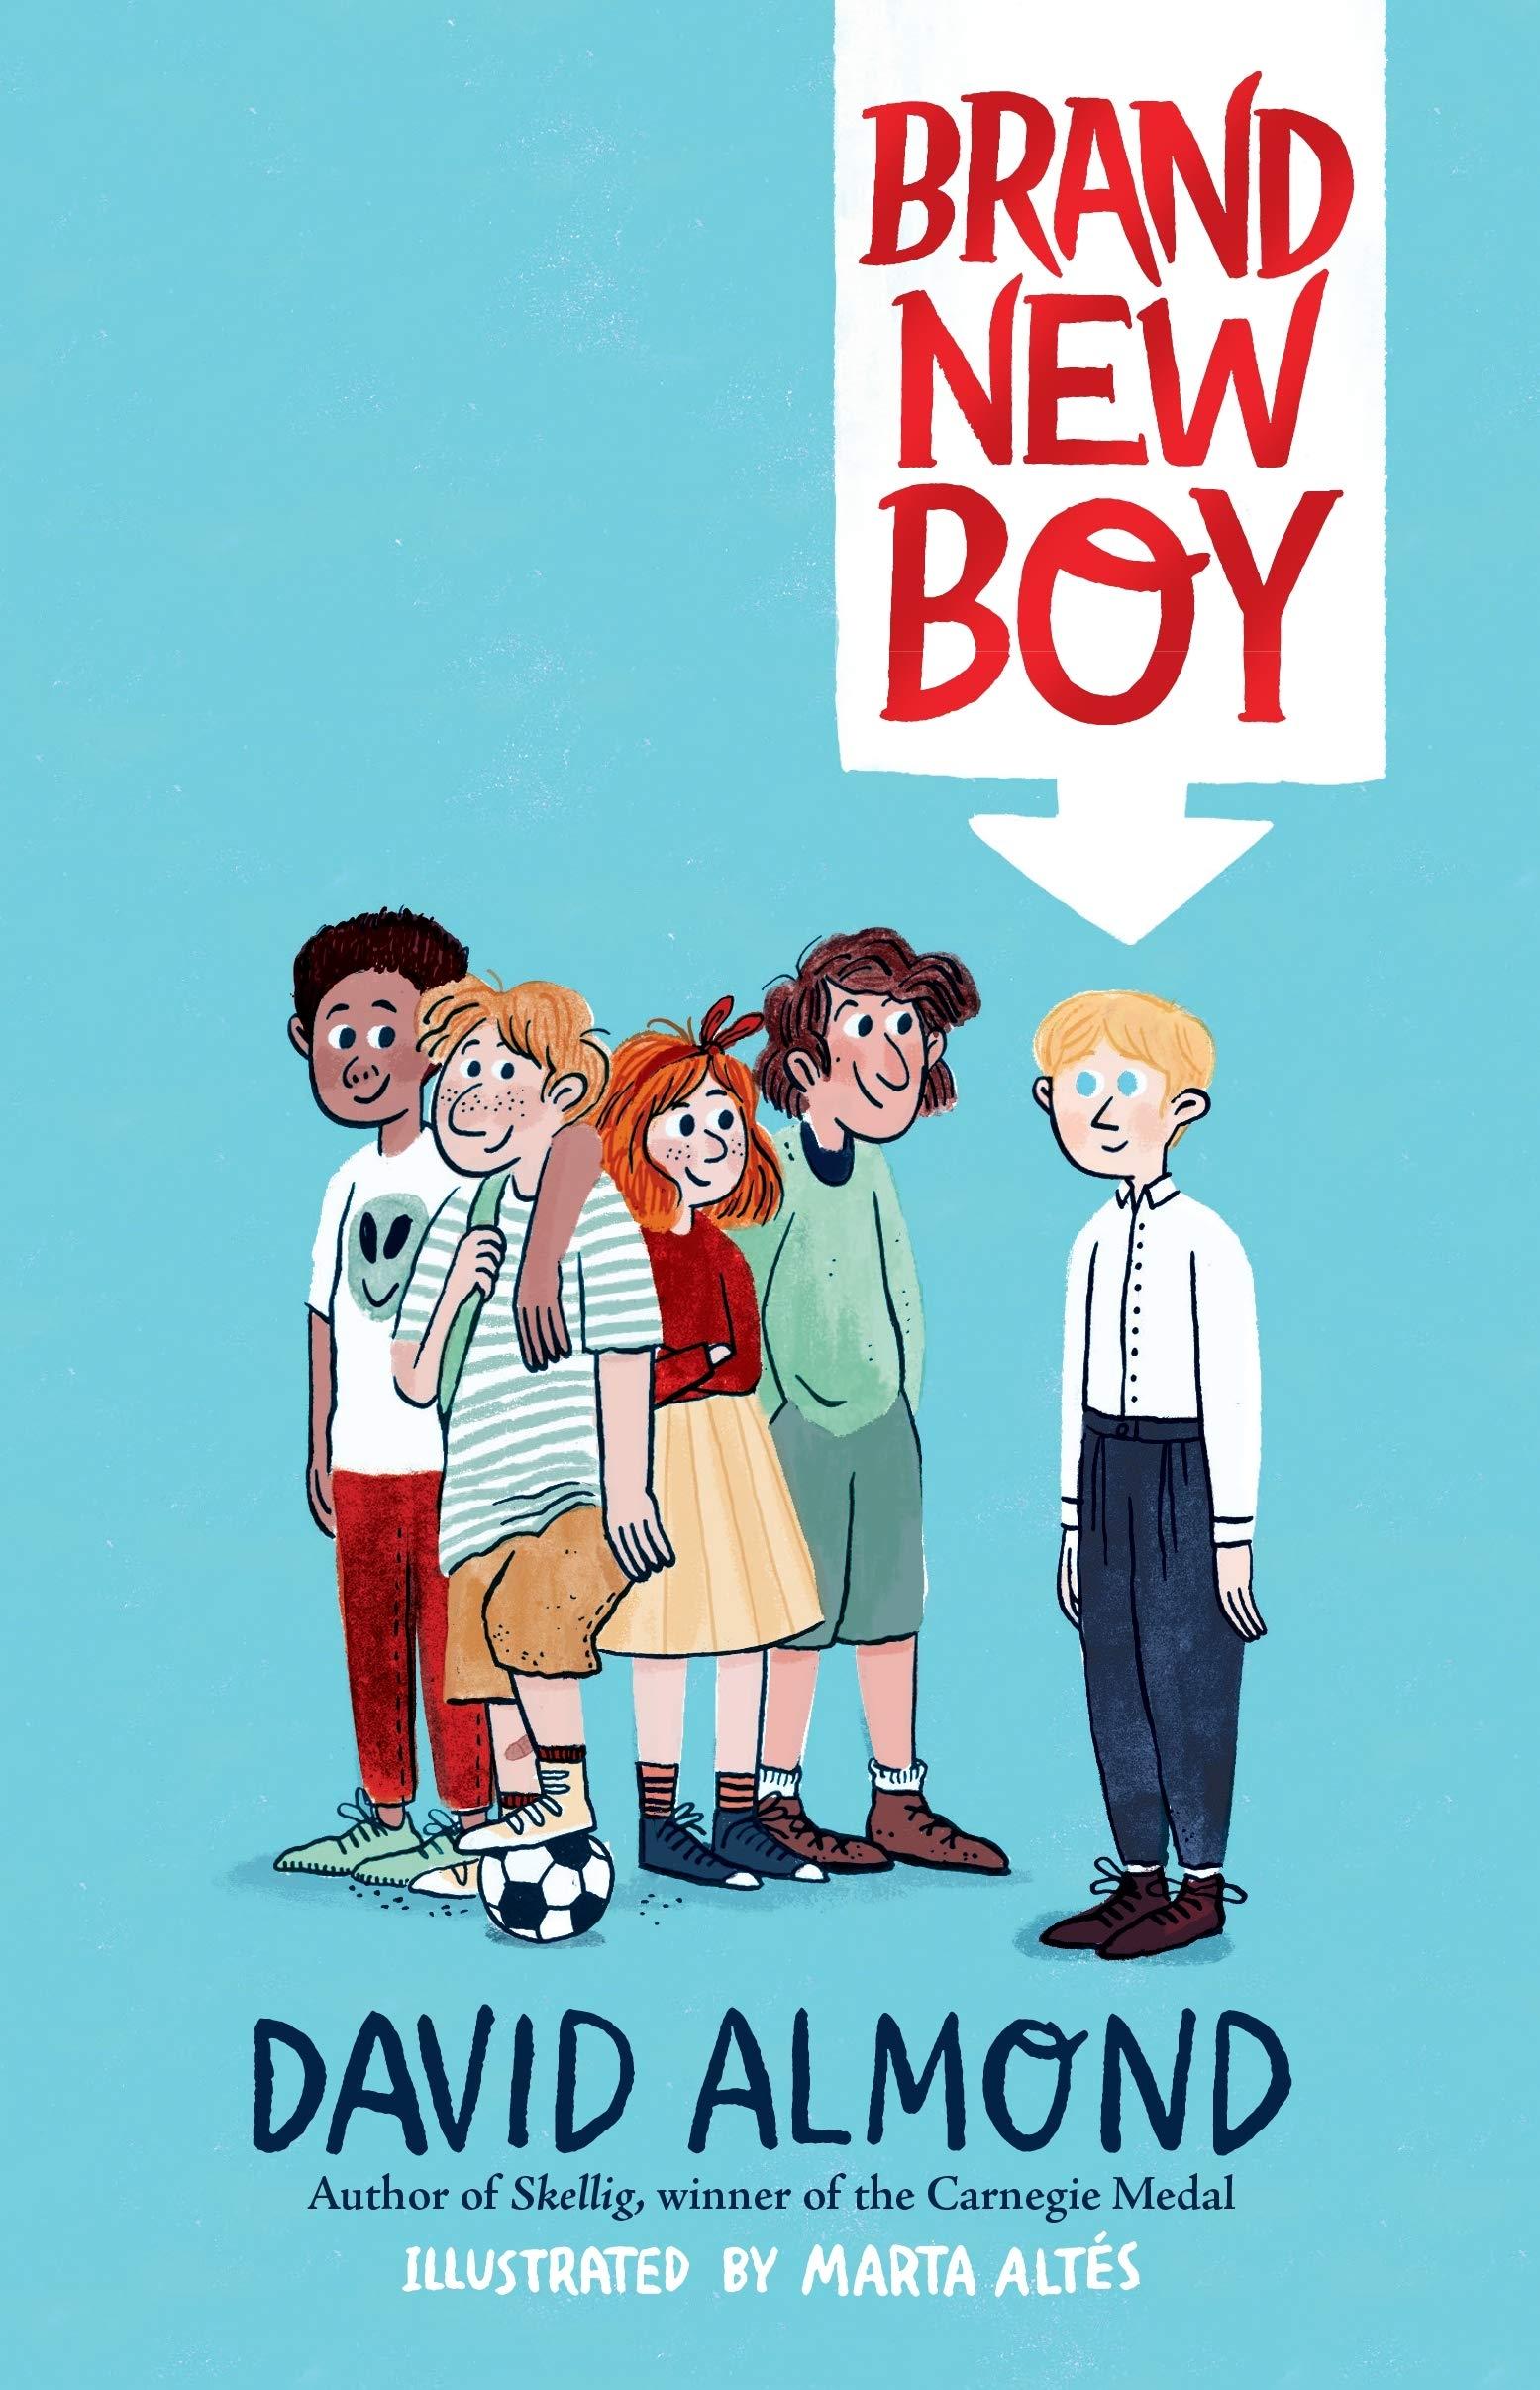 Brand New Boy by David Almond